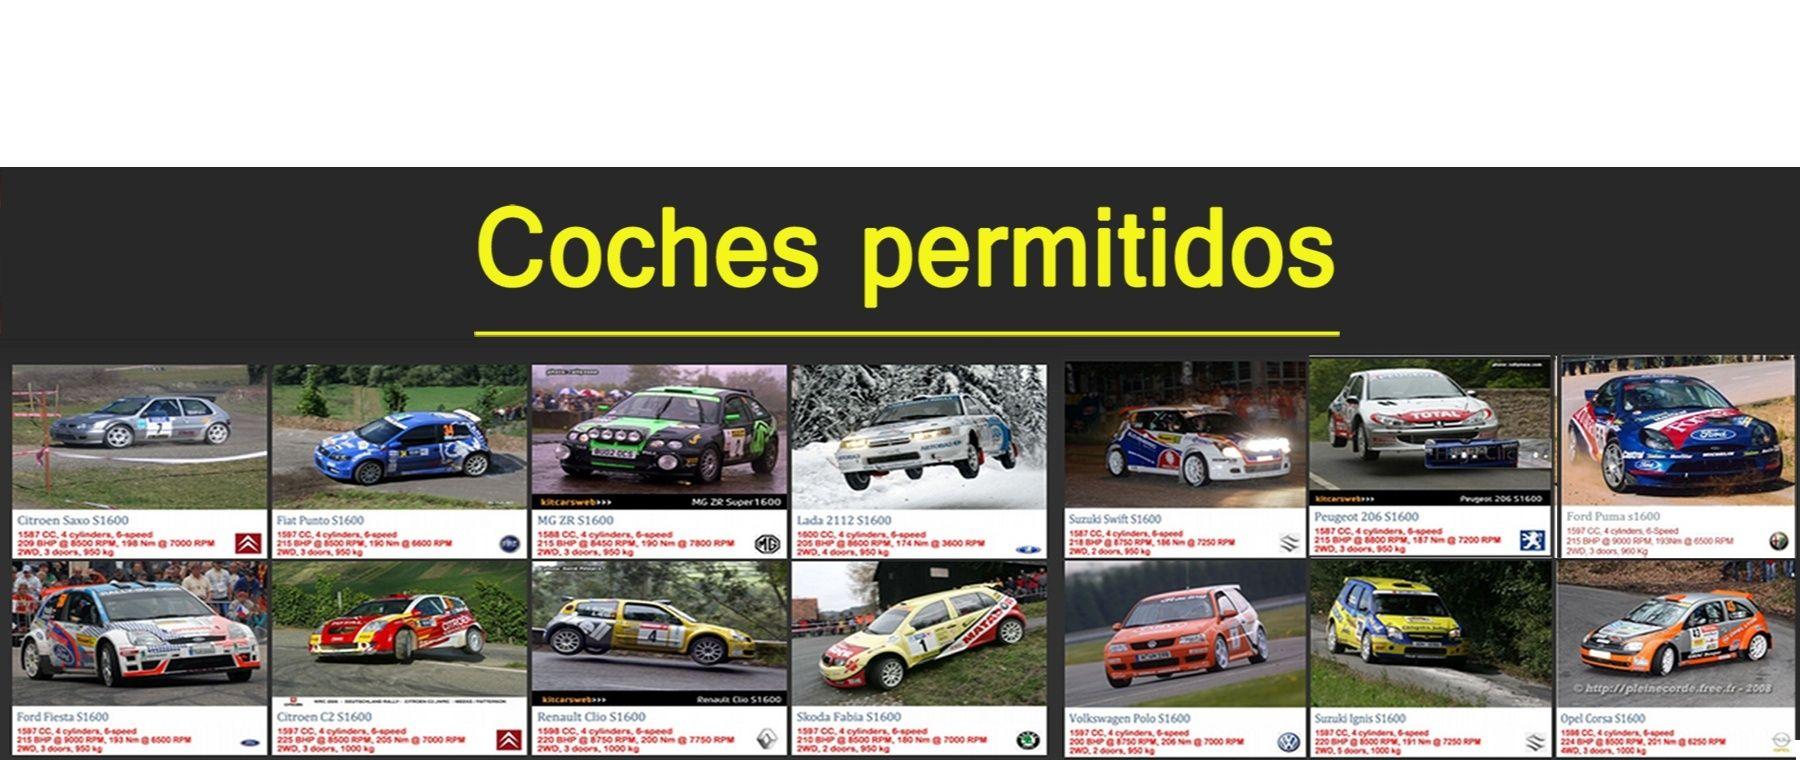 ▄▀▄ Rally Suécia  ▄▀▄          -  Snow  S1600 -      20 y 23 de agosto 2014  Coches13